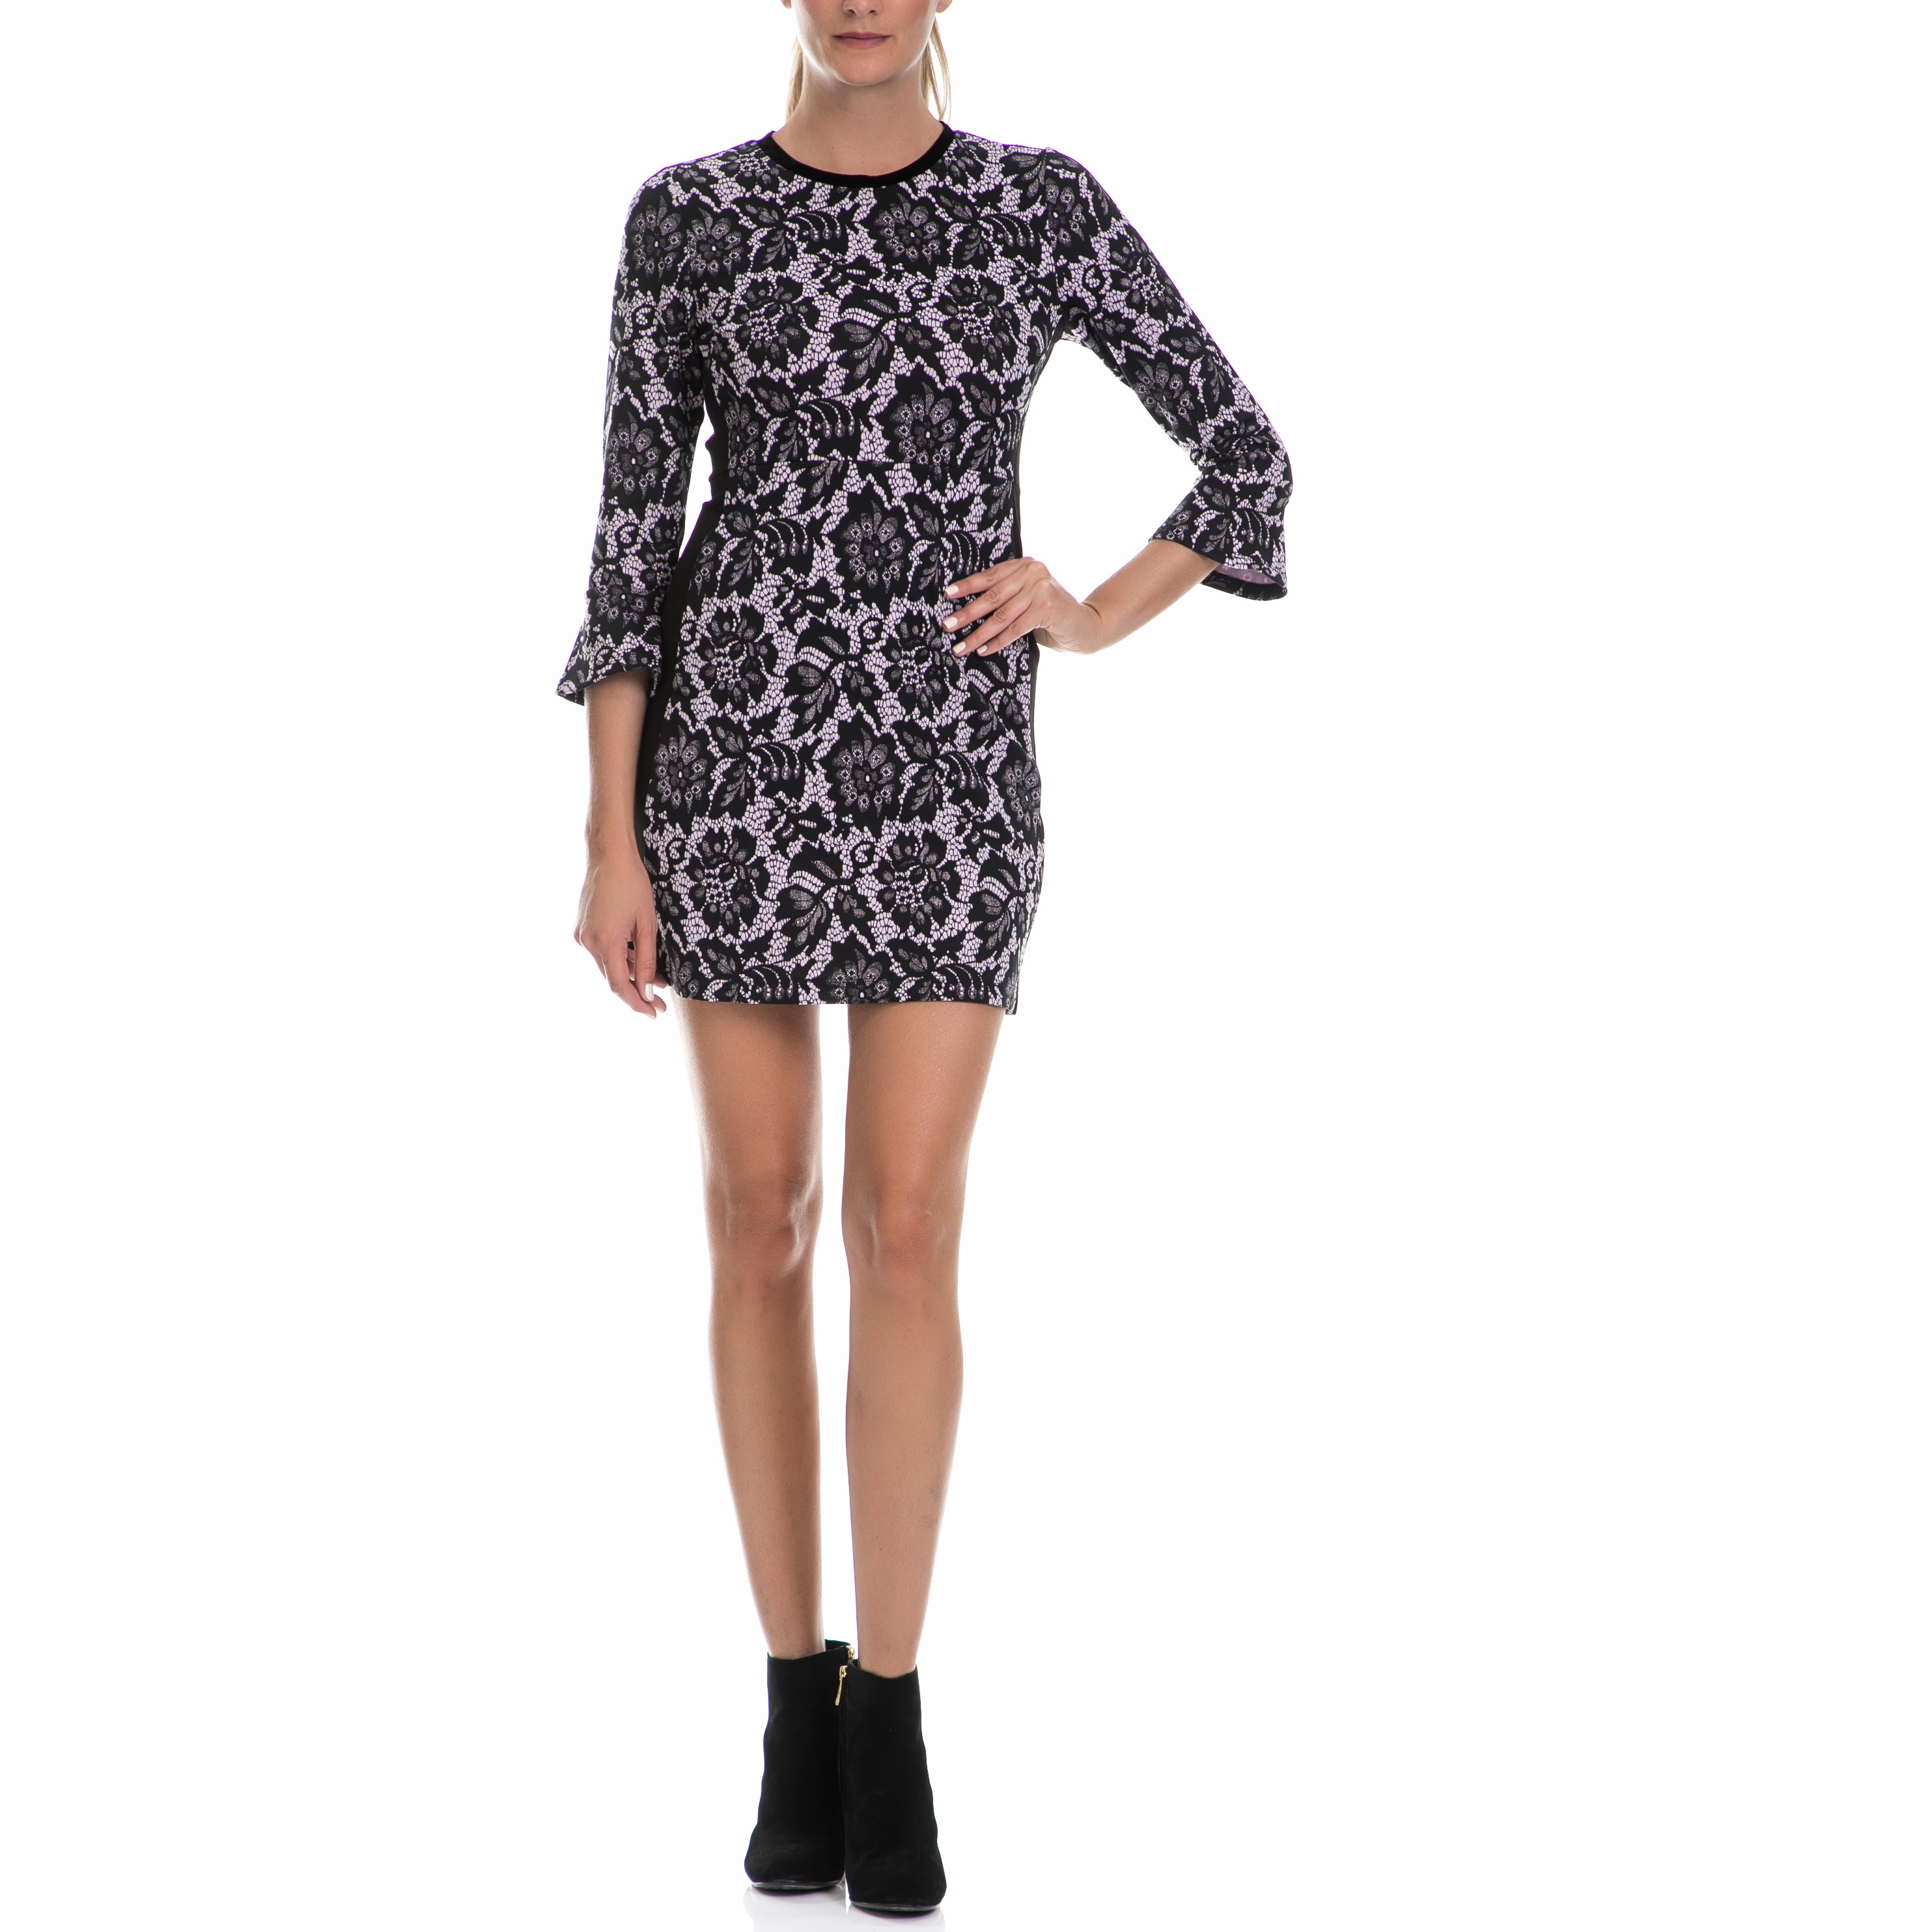 JUICY COUTURE - Φόρεμα JUICY COUTURE μαύρο-λευκό γυναικεία ρούχα φορέματα μίνι